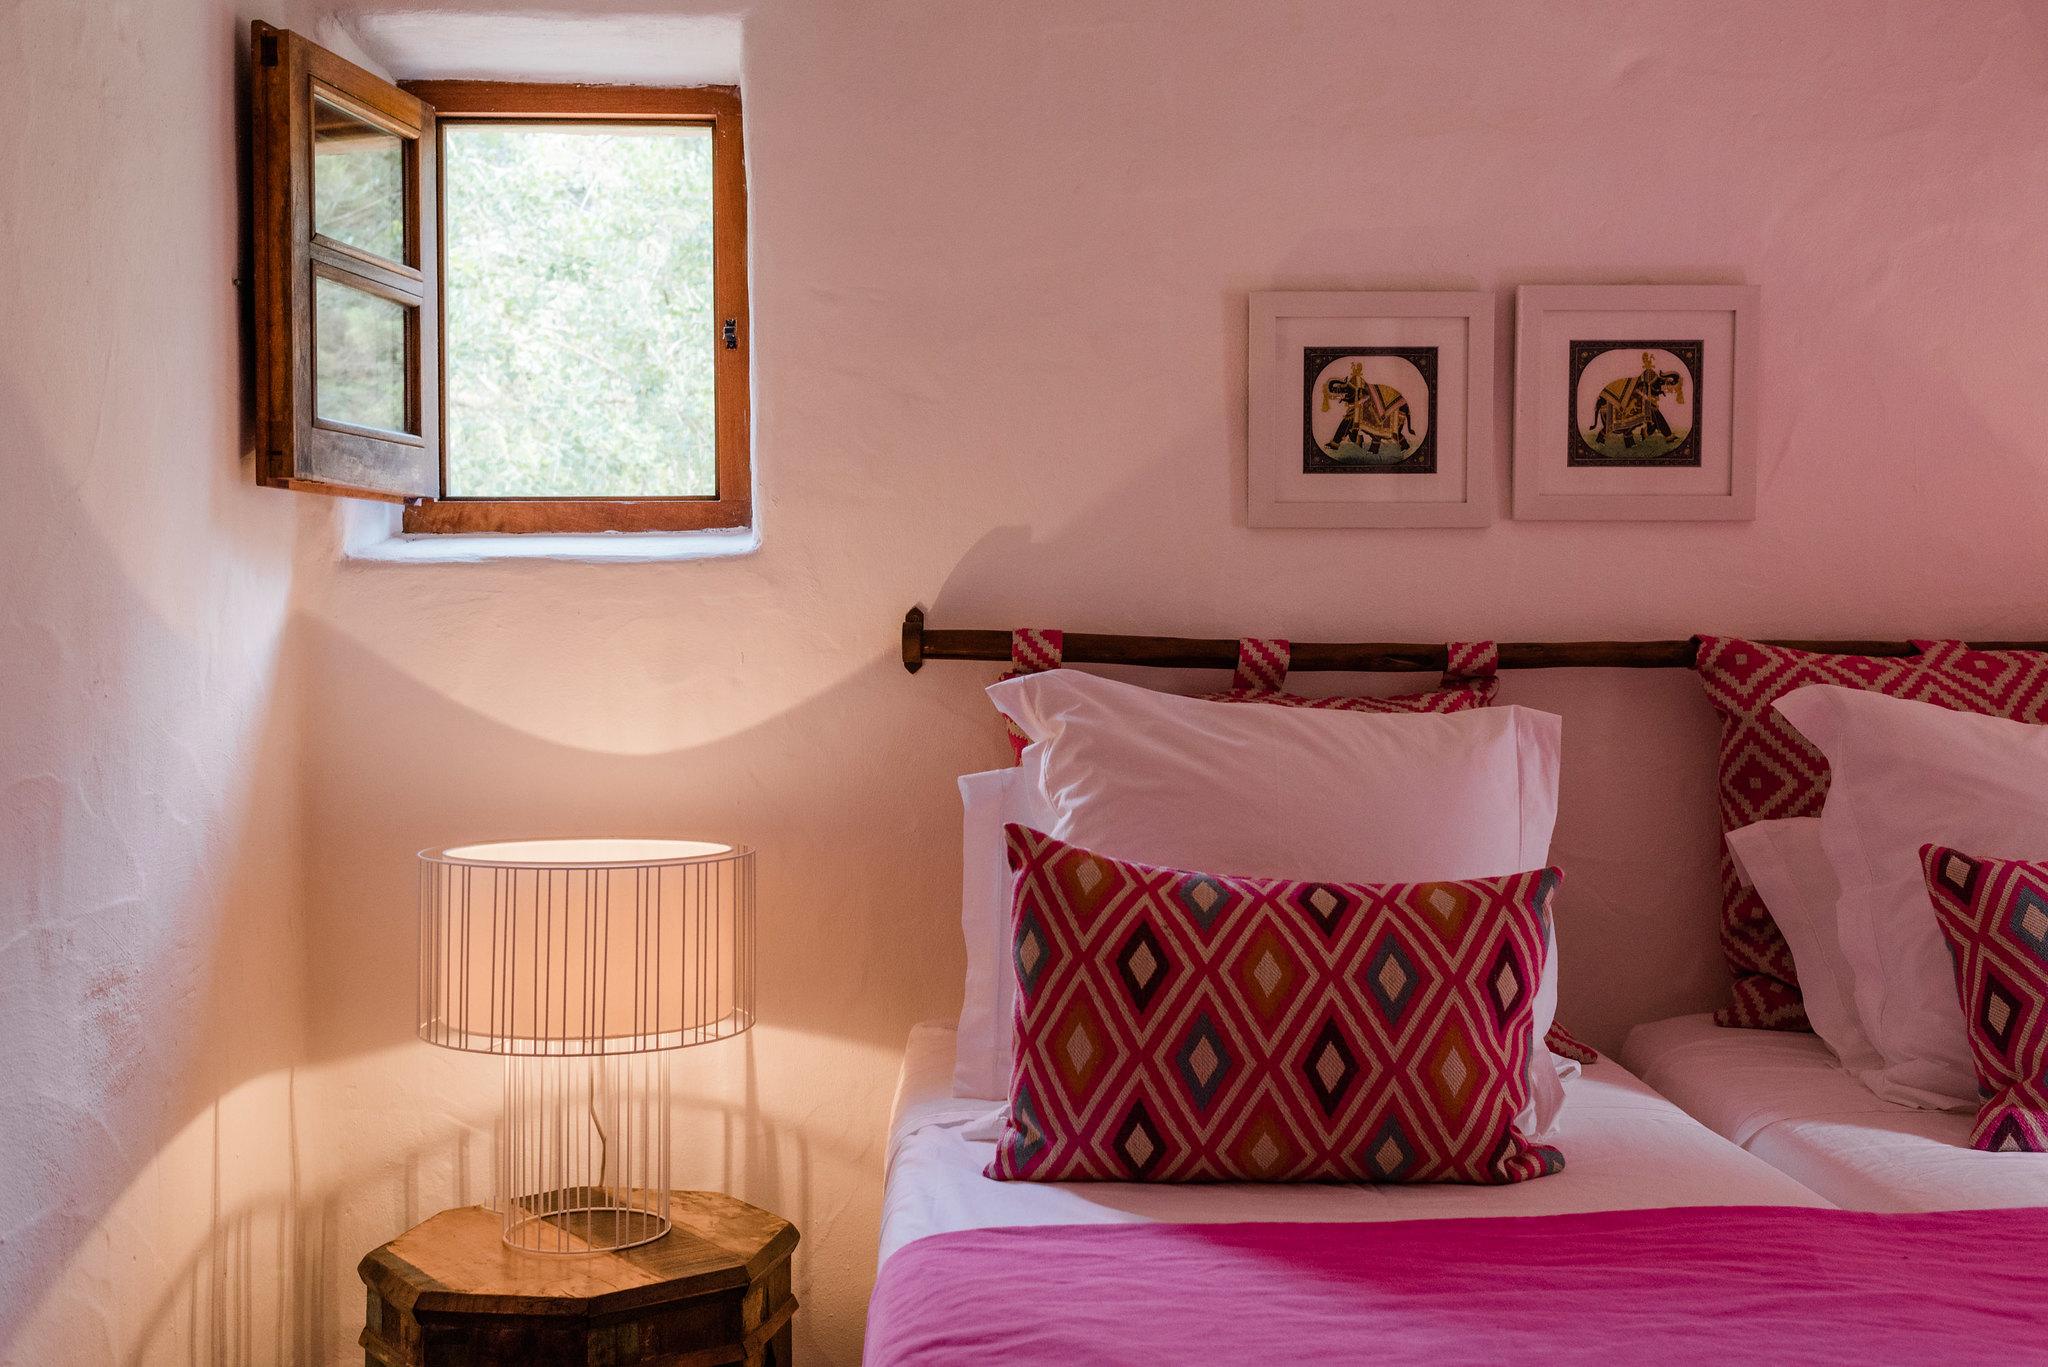 https://www.white-ibiza.com/wp-content/uploads/2020/05/white-ibiza-villas-can-sabina-interior-bedroom5.jpg